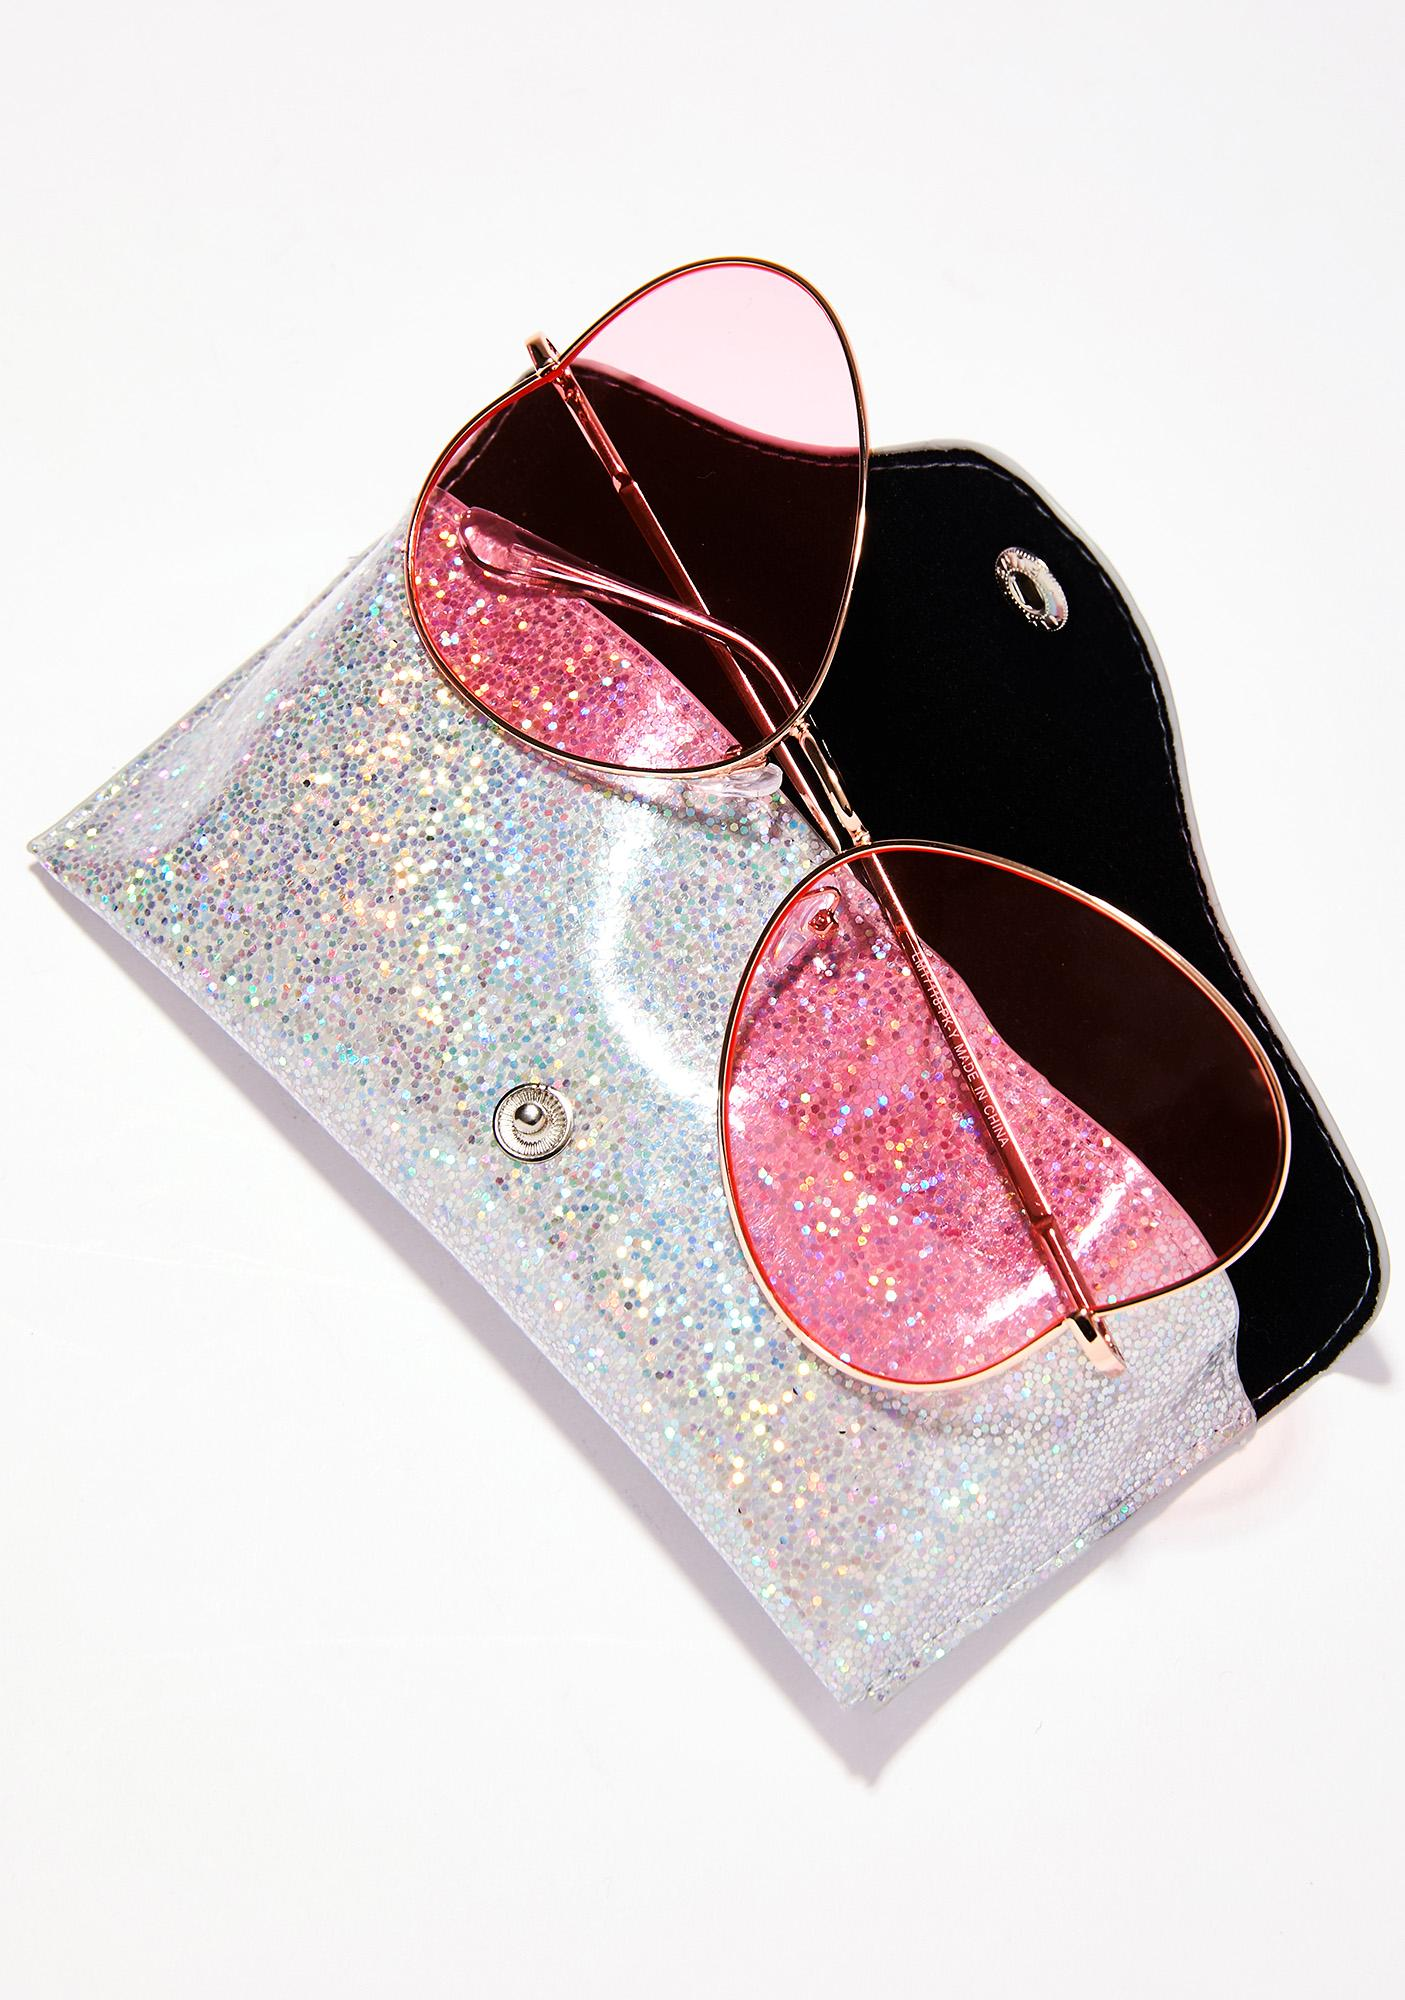 Skinnydip Glitter Sunglasses Pouch